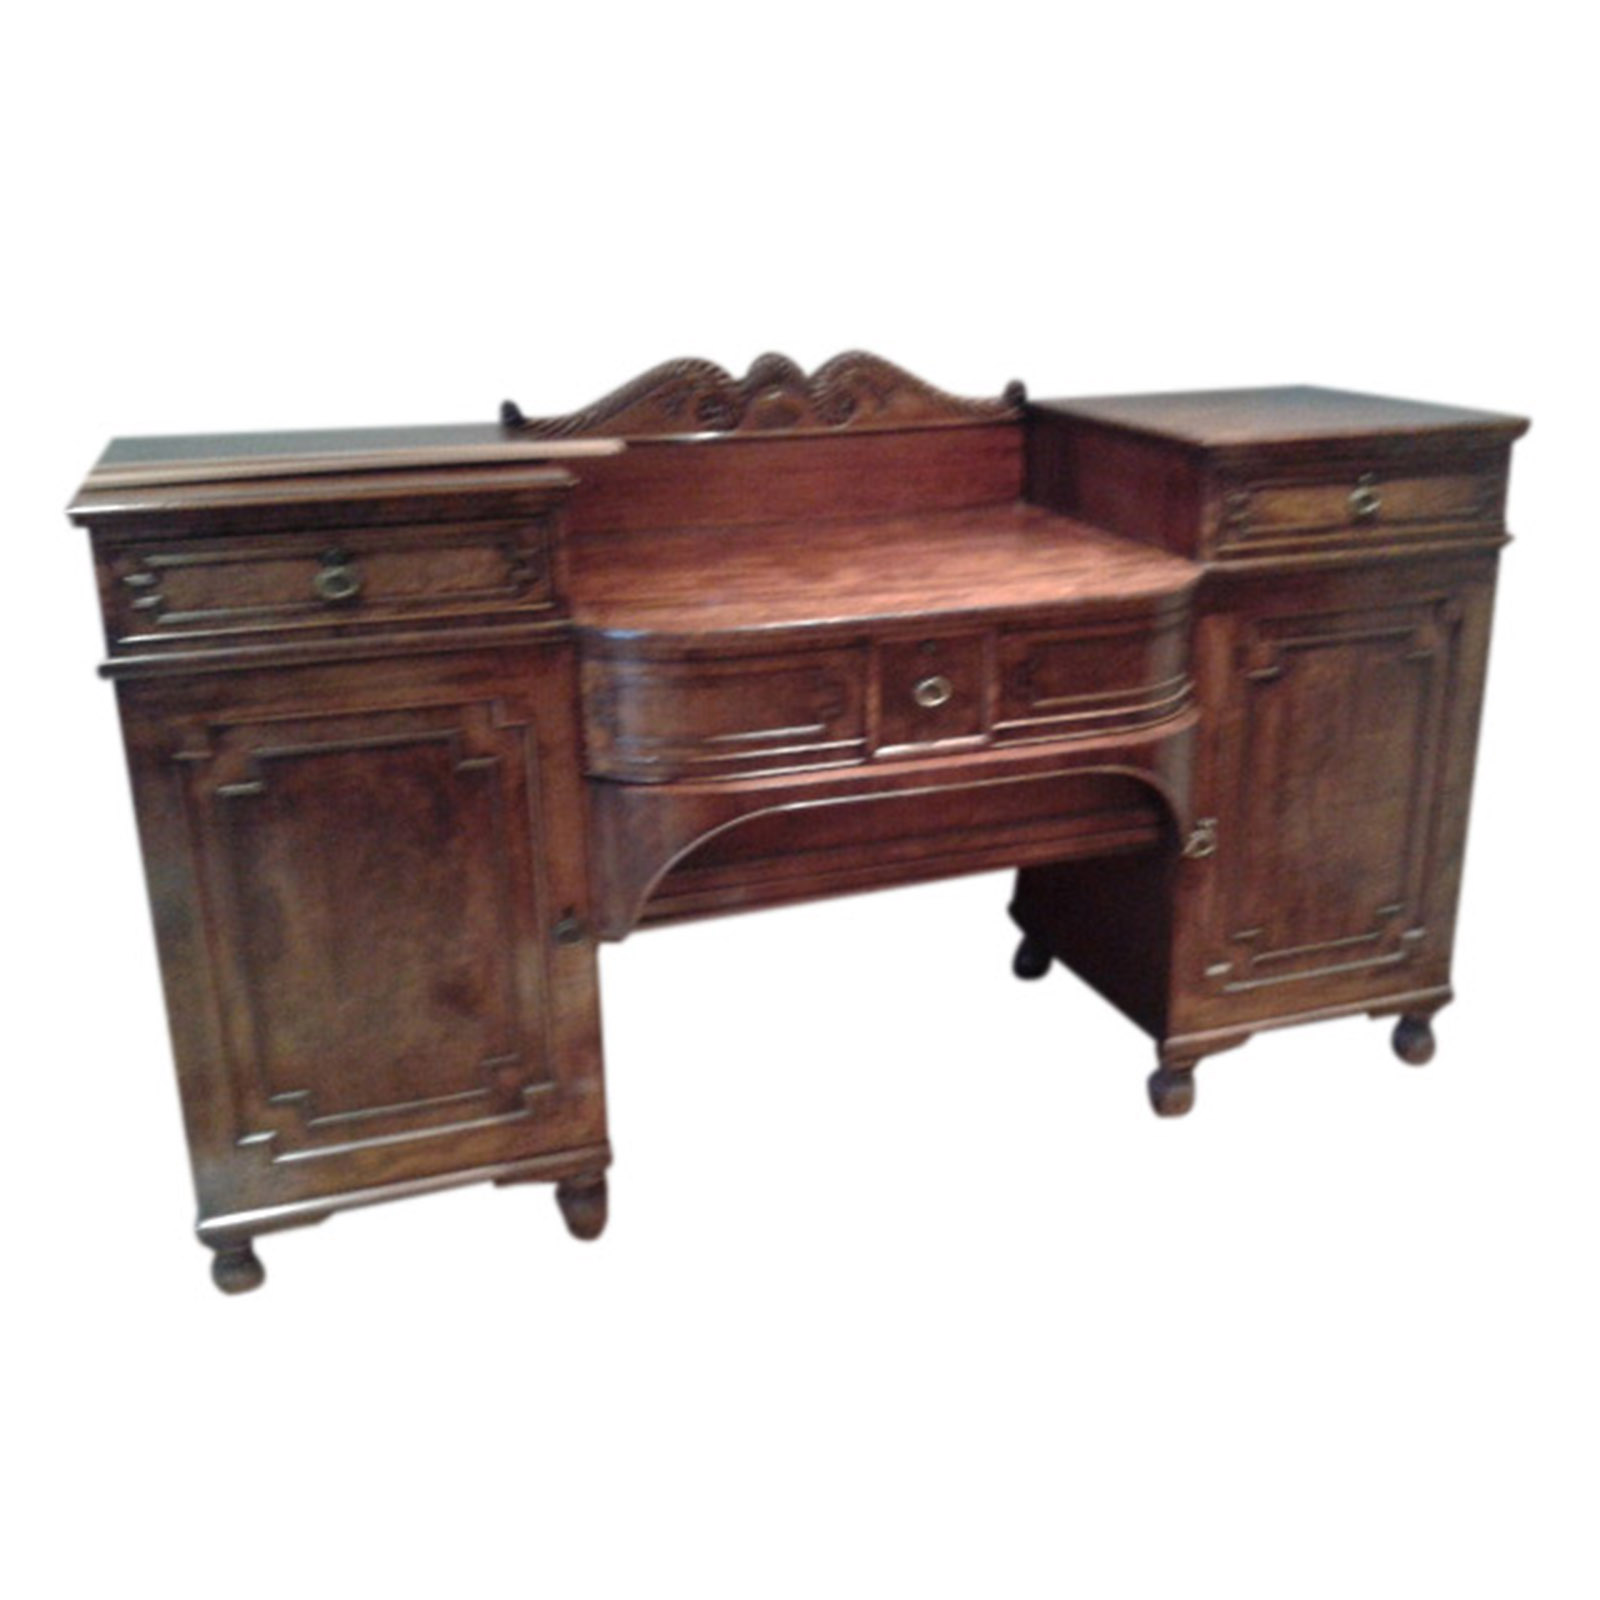 Quality Regency Mahogany Sideboard